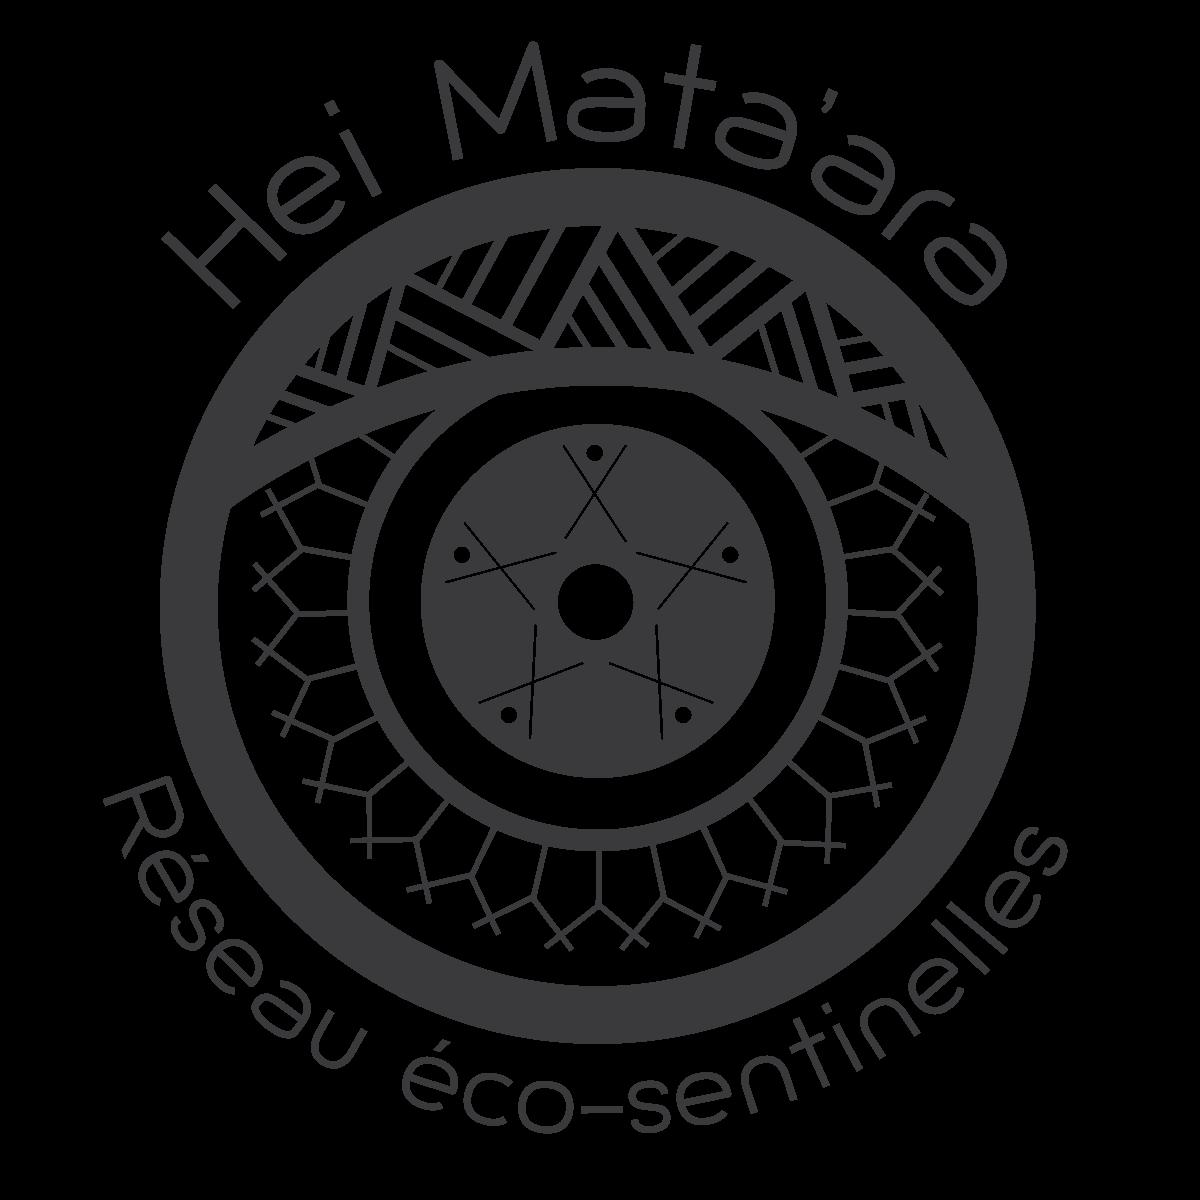 Logo-Hei-mata'ara